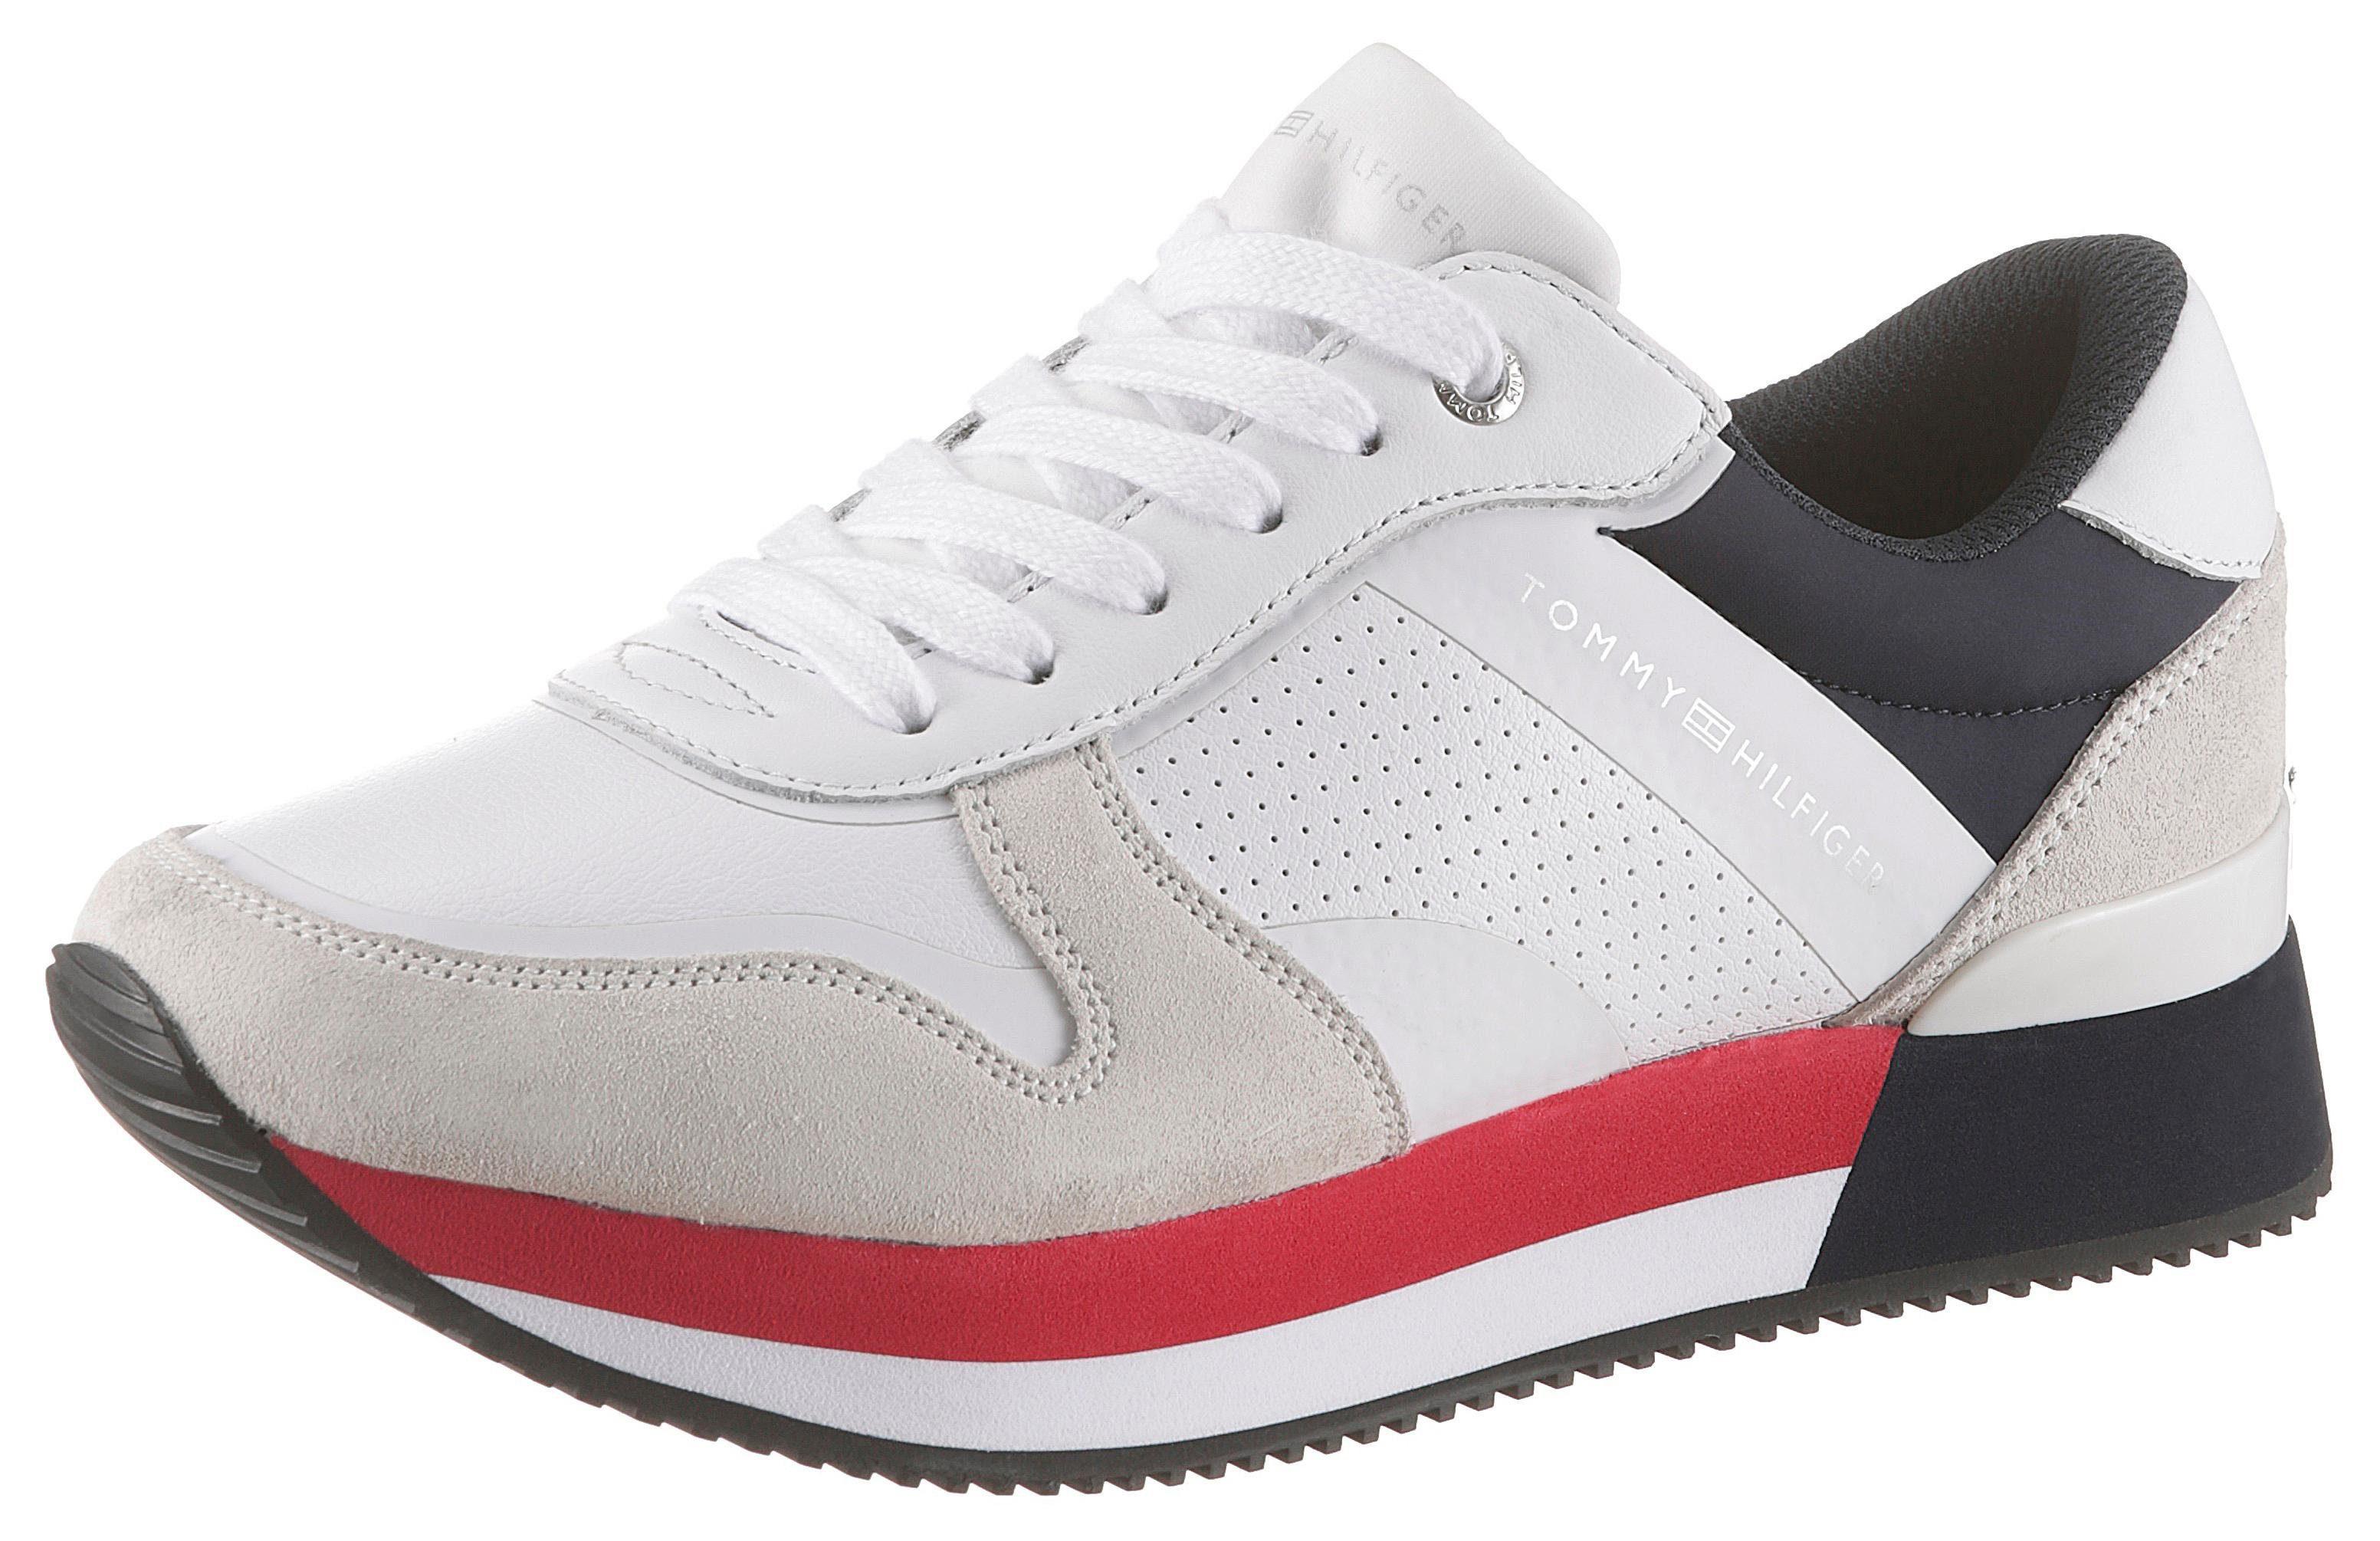 TOMMY HILFIGER »WMNS NEIL 3A« Sneaker mit 2,5 cm Plateausohle online kaufen | OTTO